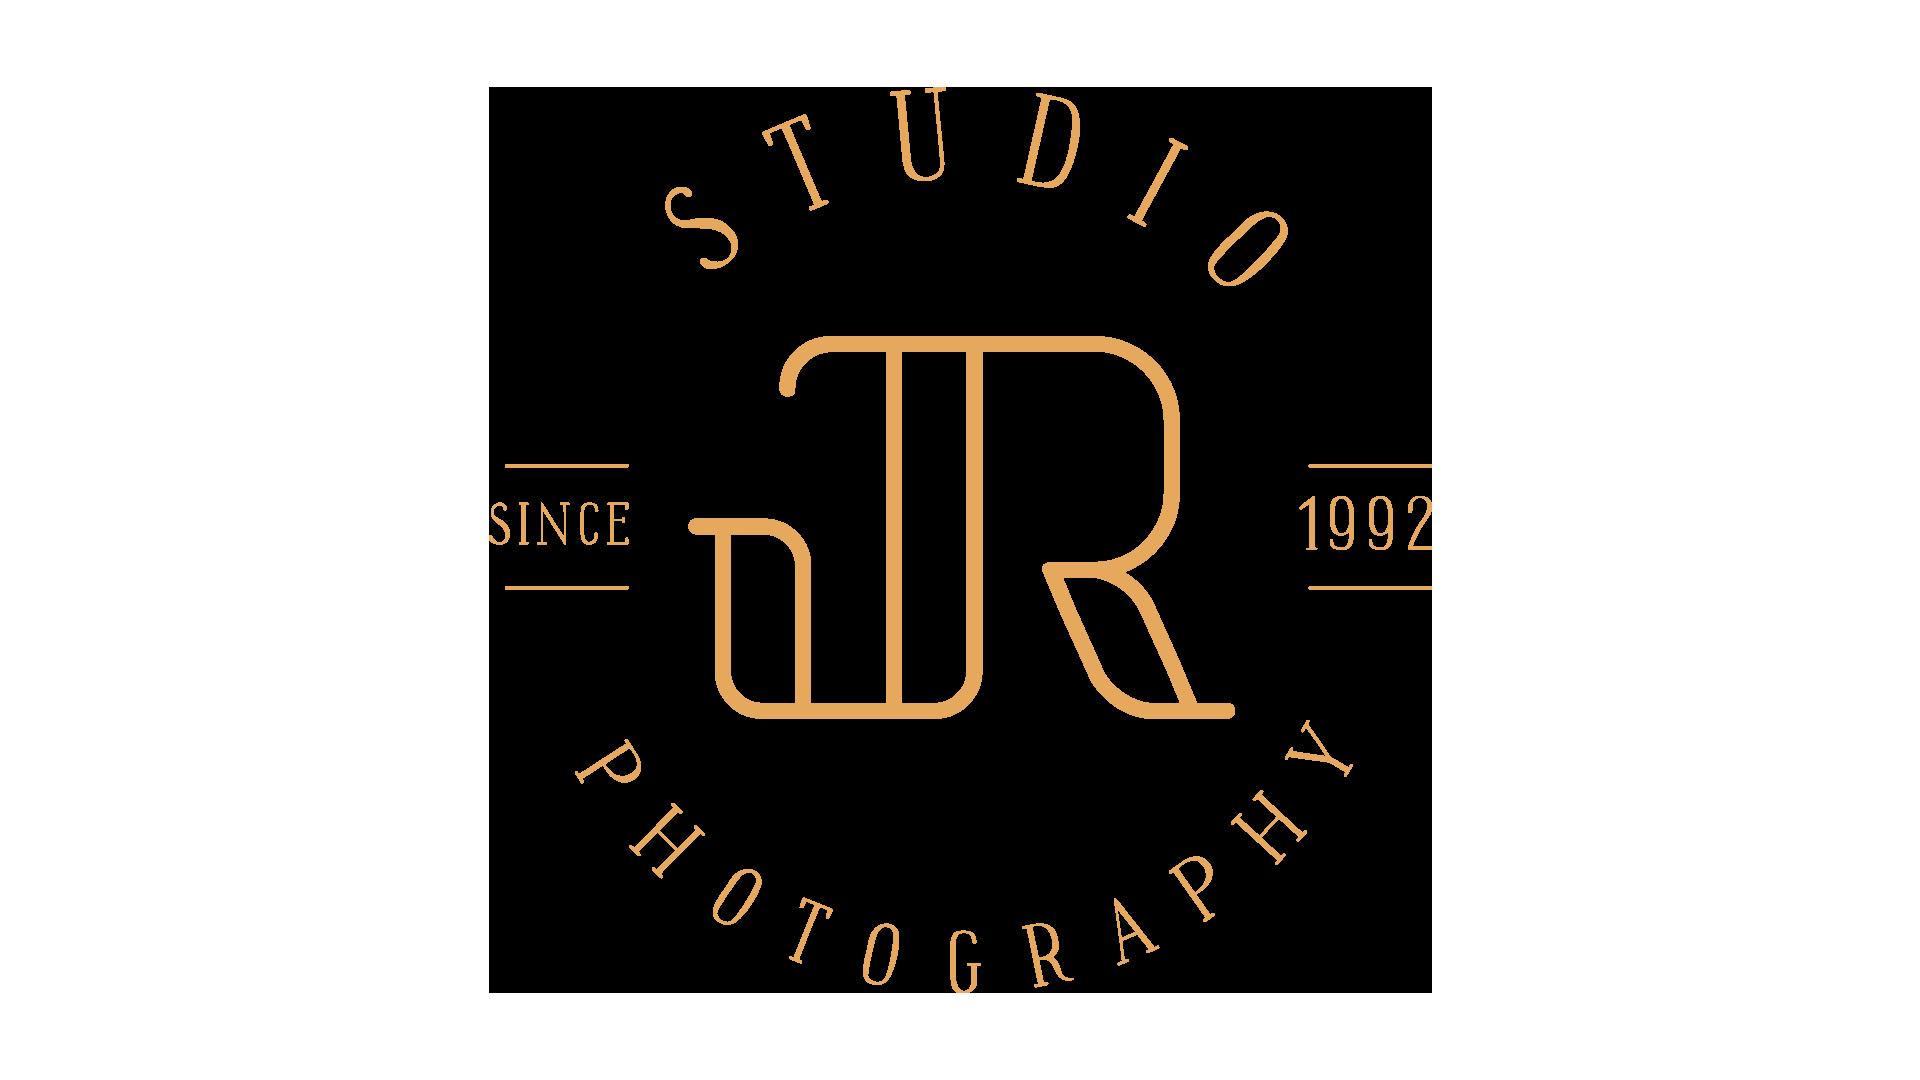 Contate Studio Jr